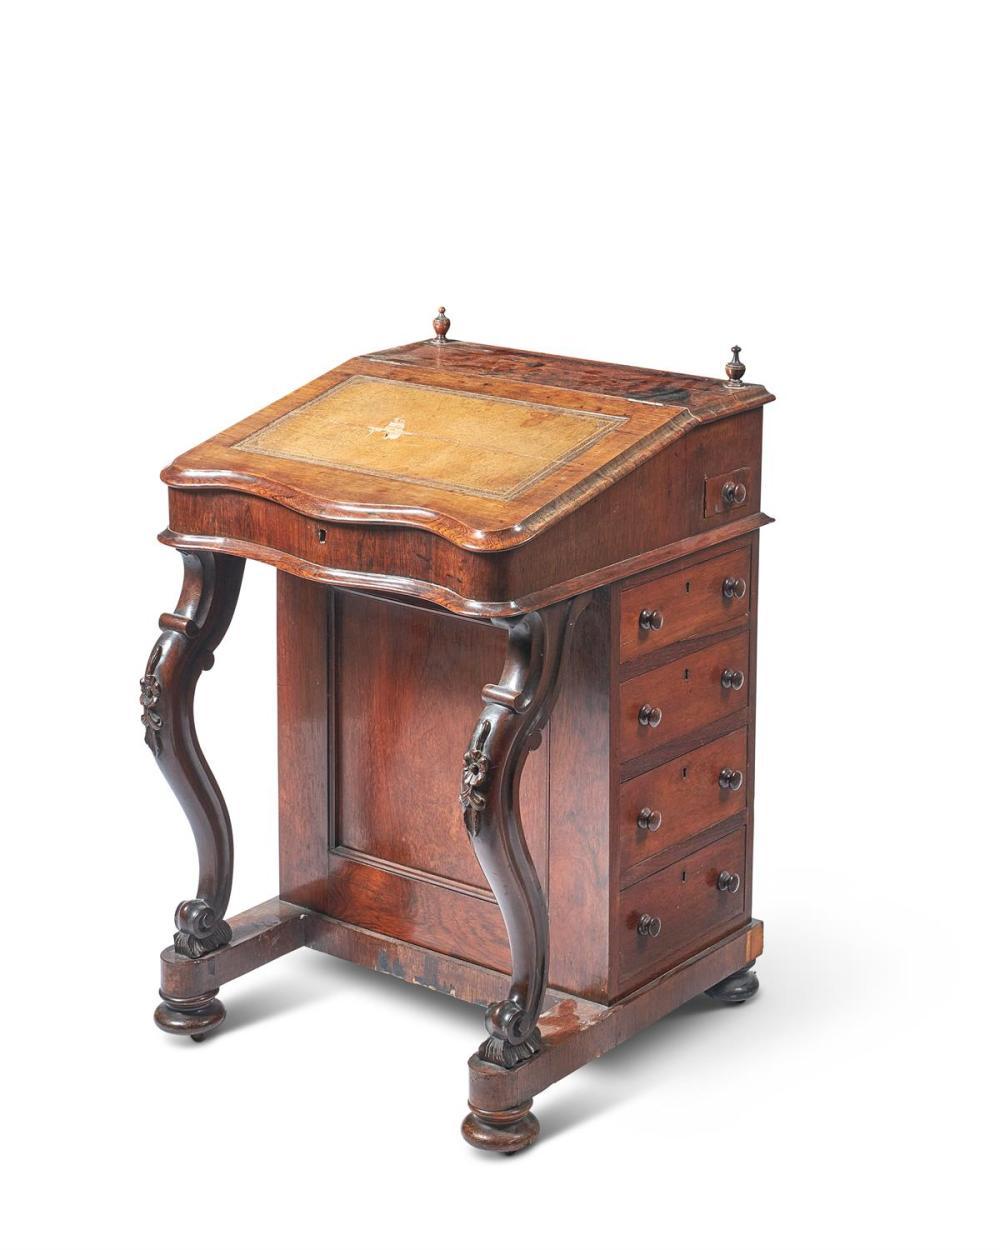 Y A VICTORIAN ROSEWOOD DAVENPORT, CIRCA 1860